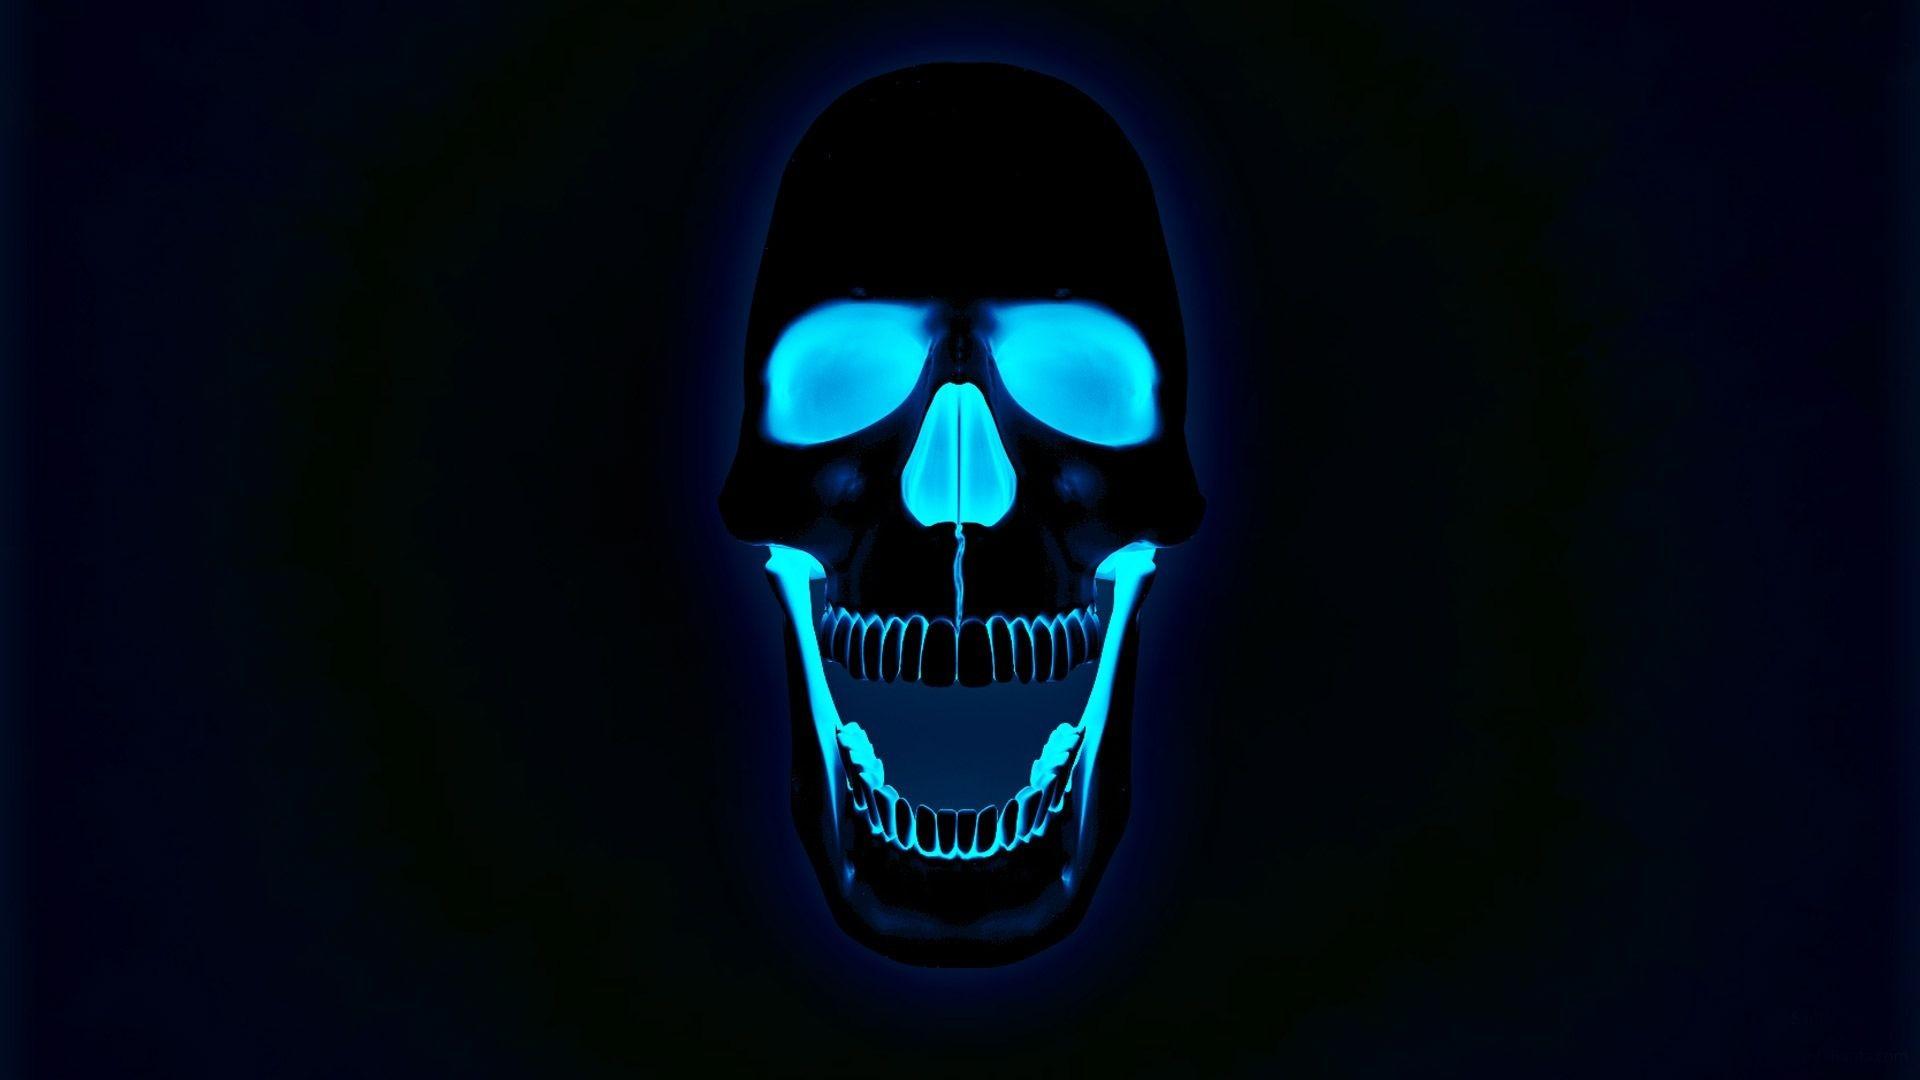 Res: 1920x1080, ... Widescreen Wallpapers: Skull, (, V.914) - GLaureL Pack IV ...